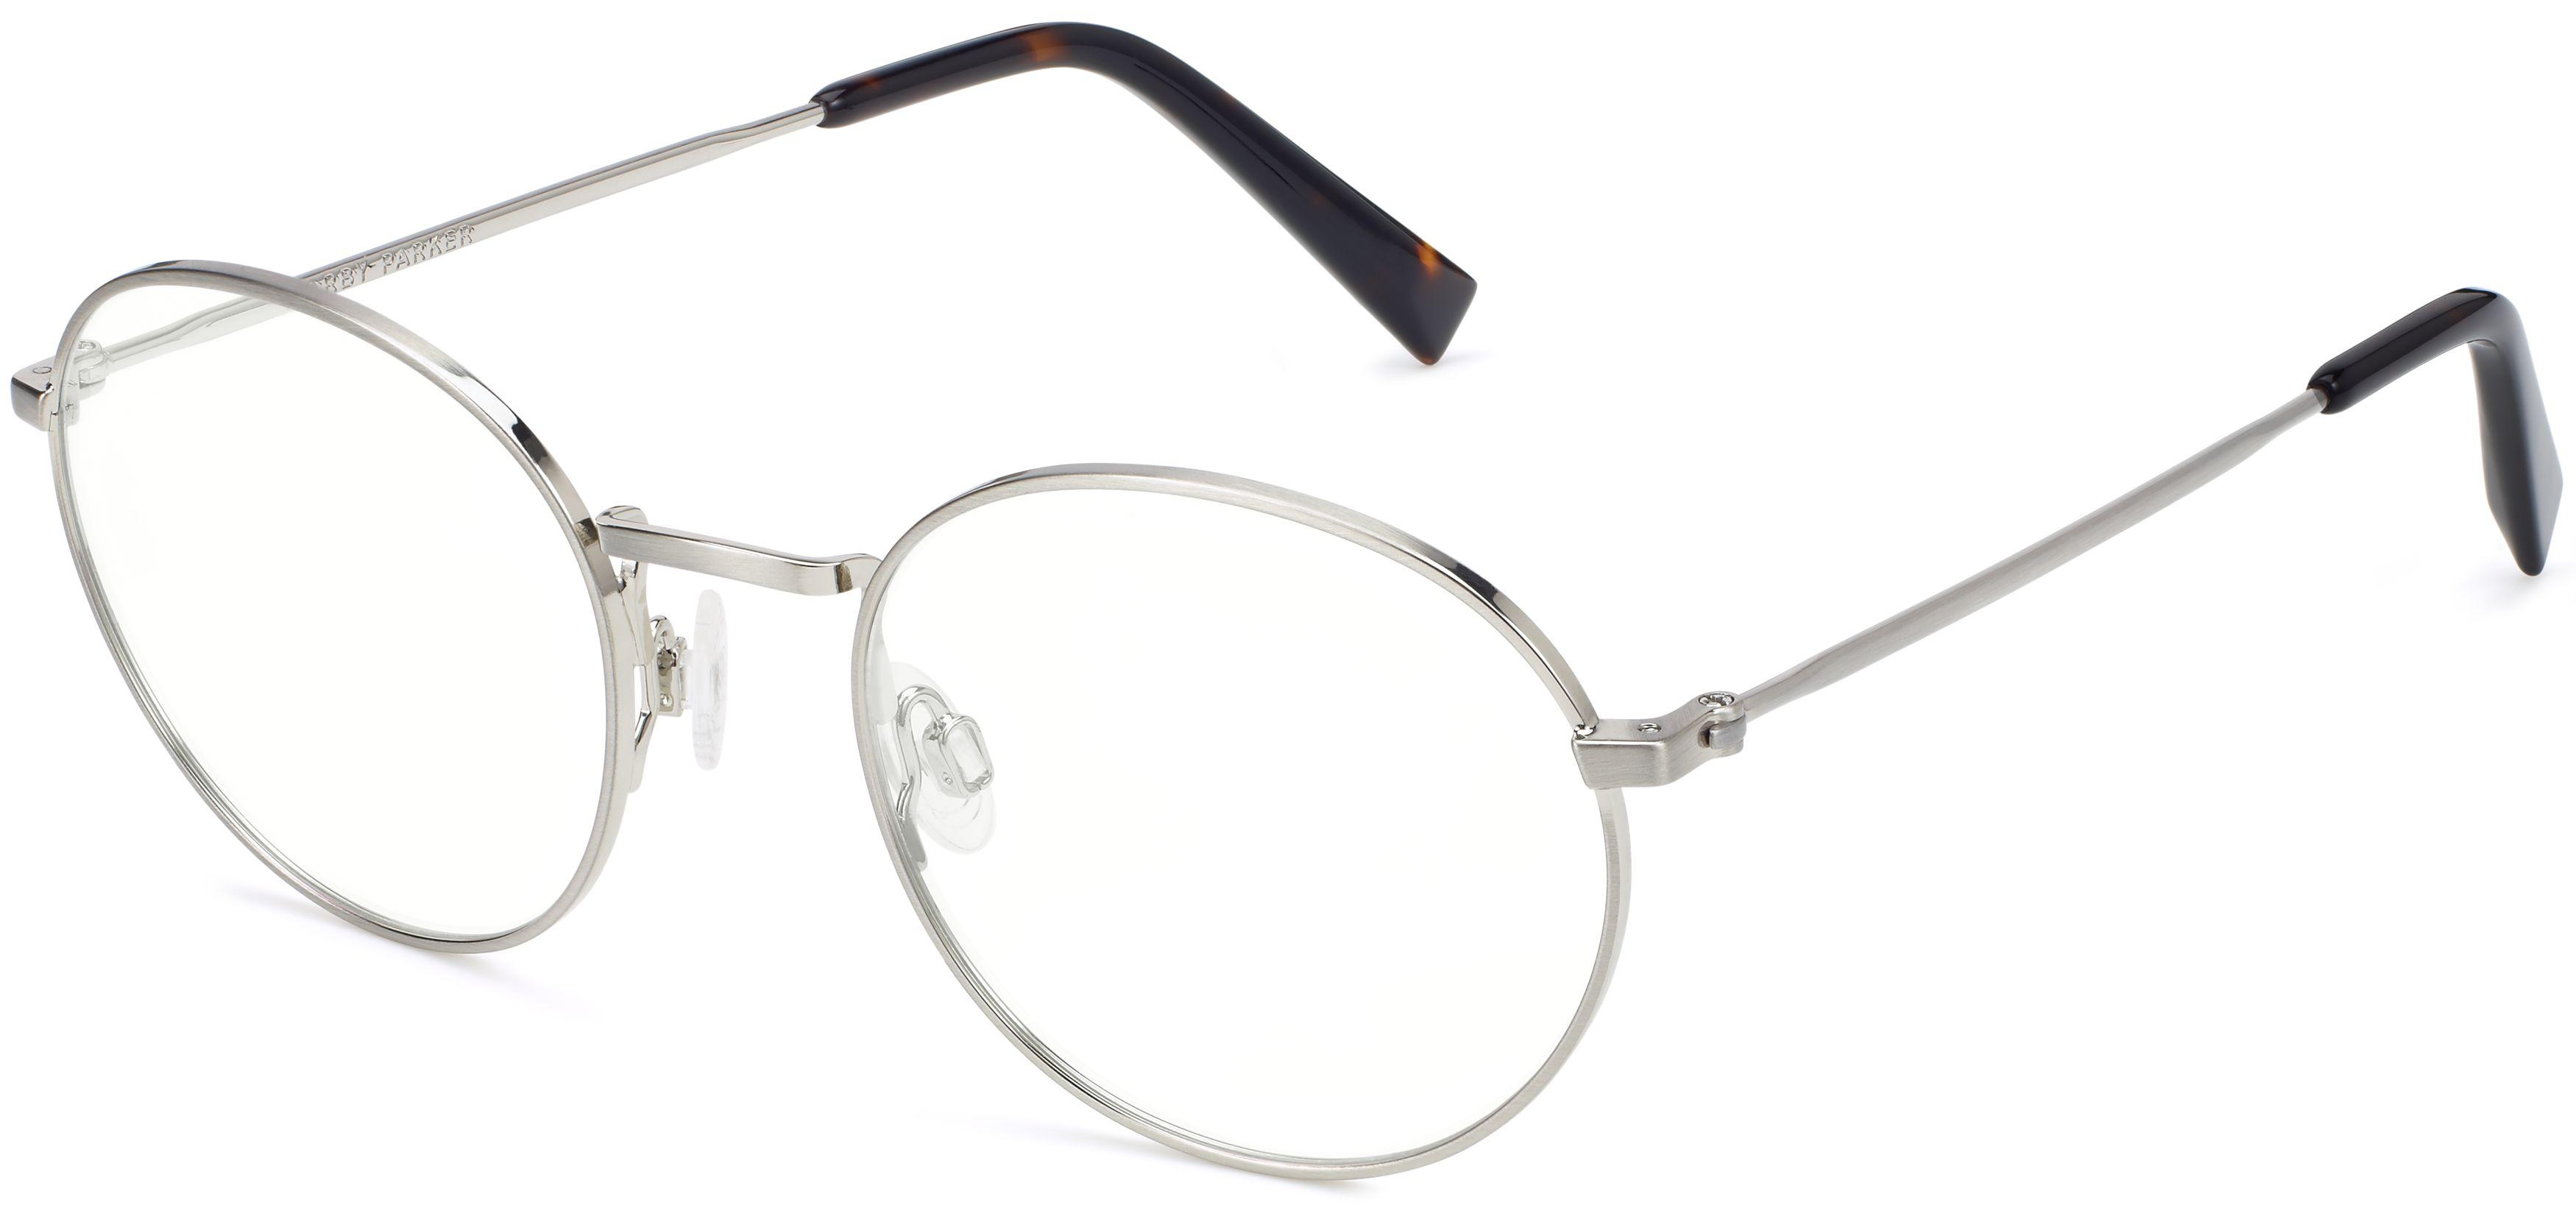 b59eebdf076 Simon Eyeglasses in Antique Silver for Men